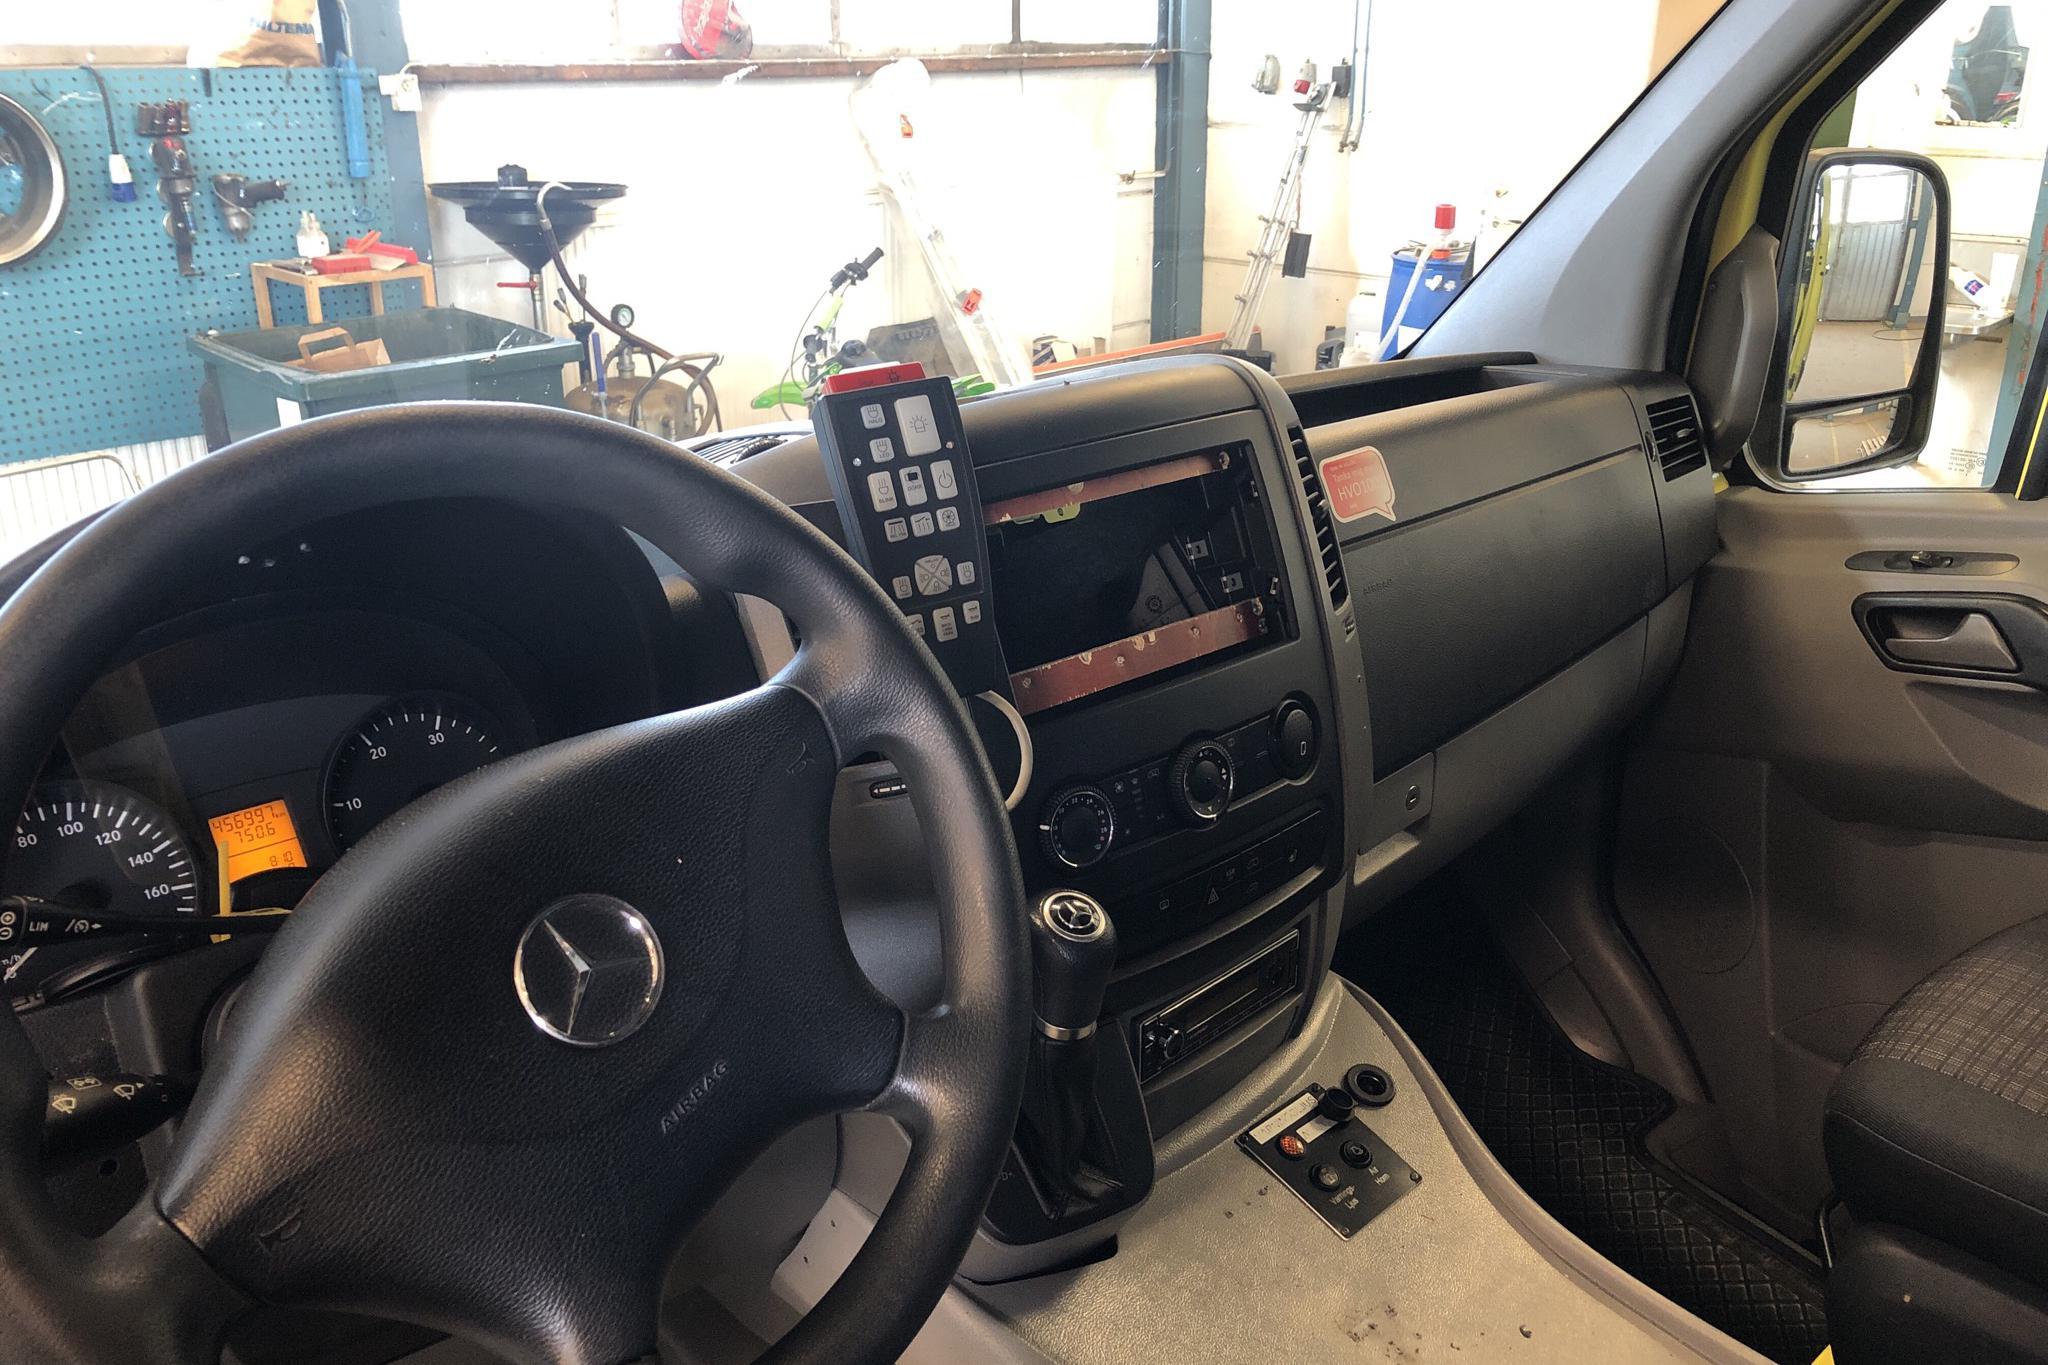 Mercedes Sprinter Ambulans 316 CDI (163hk) - 456 990 km - Automatic - yellow - 2014